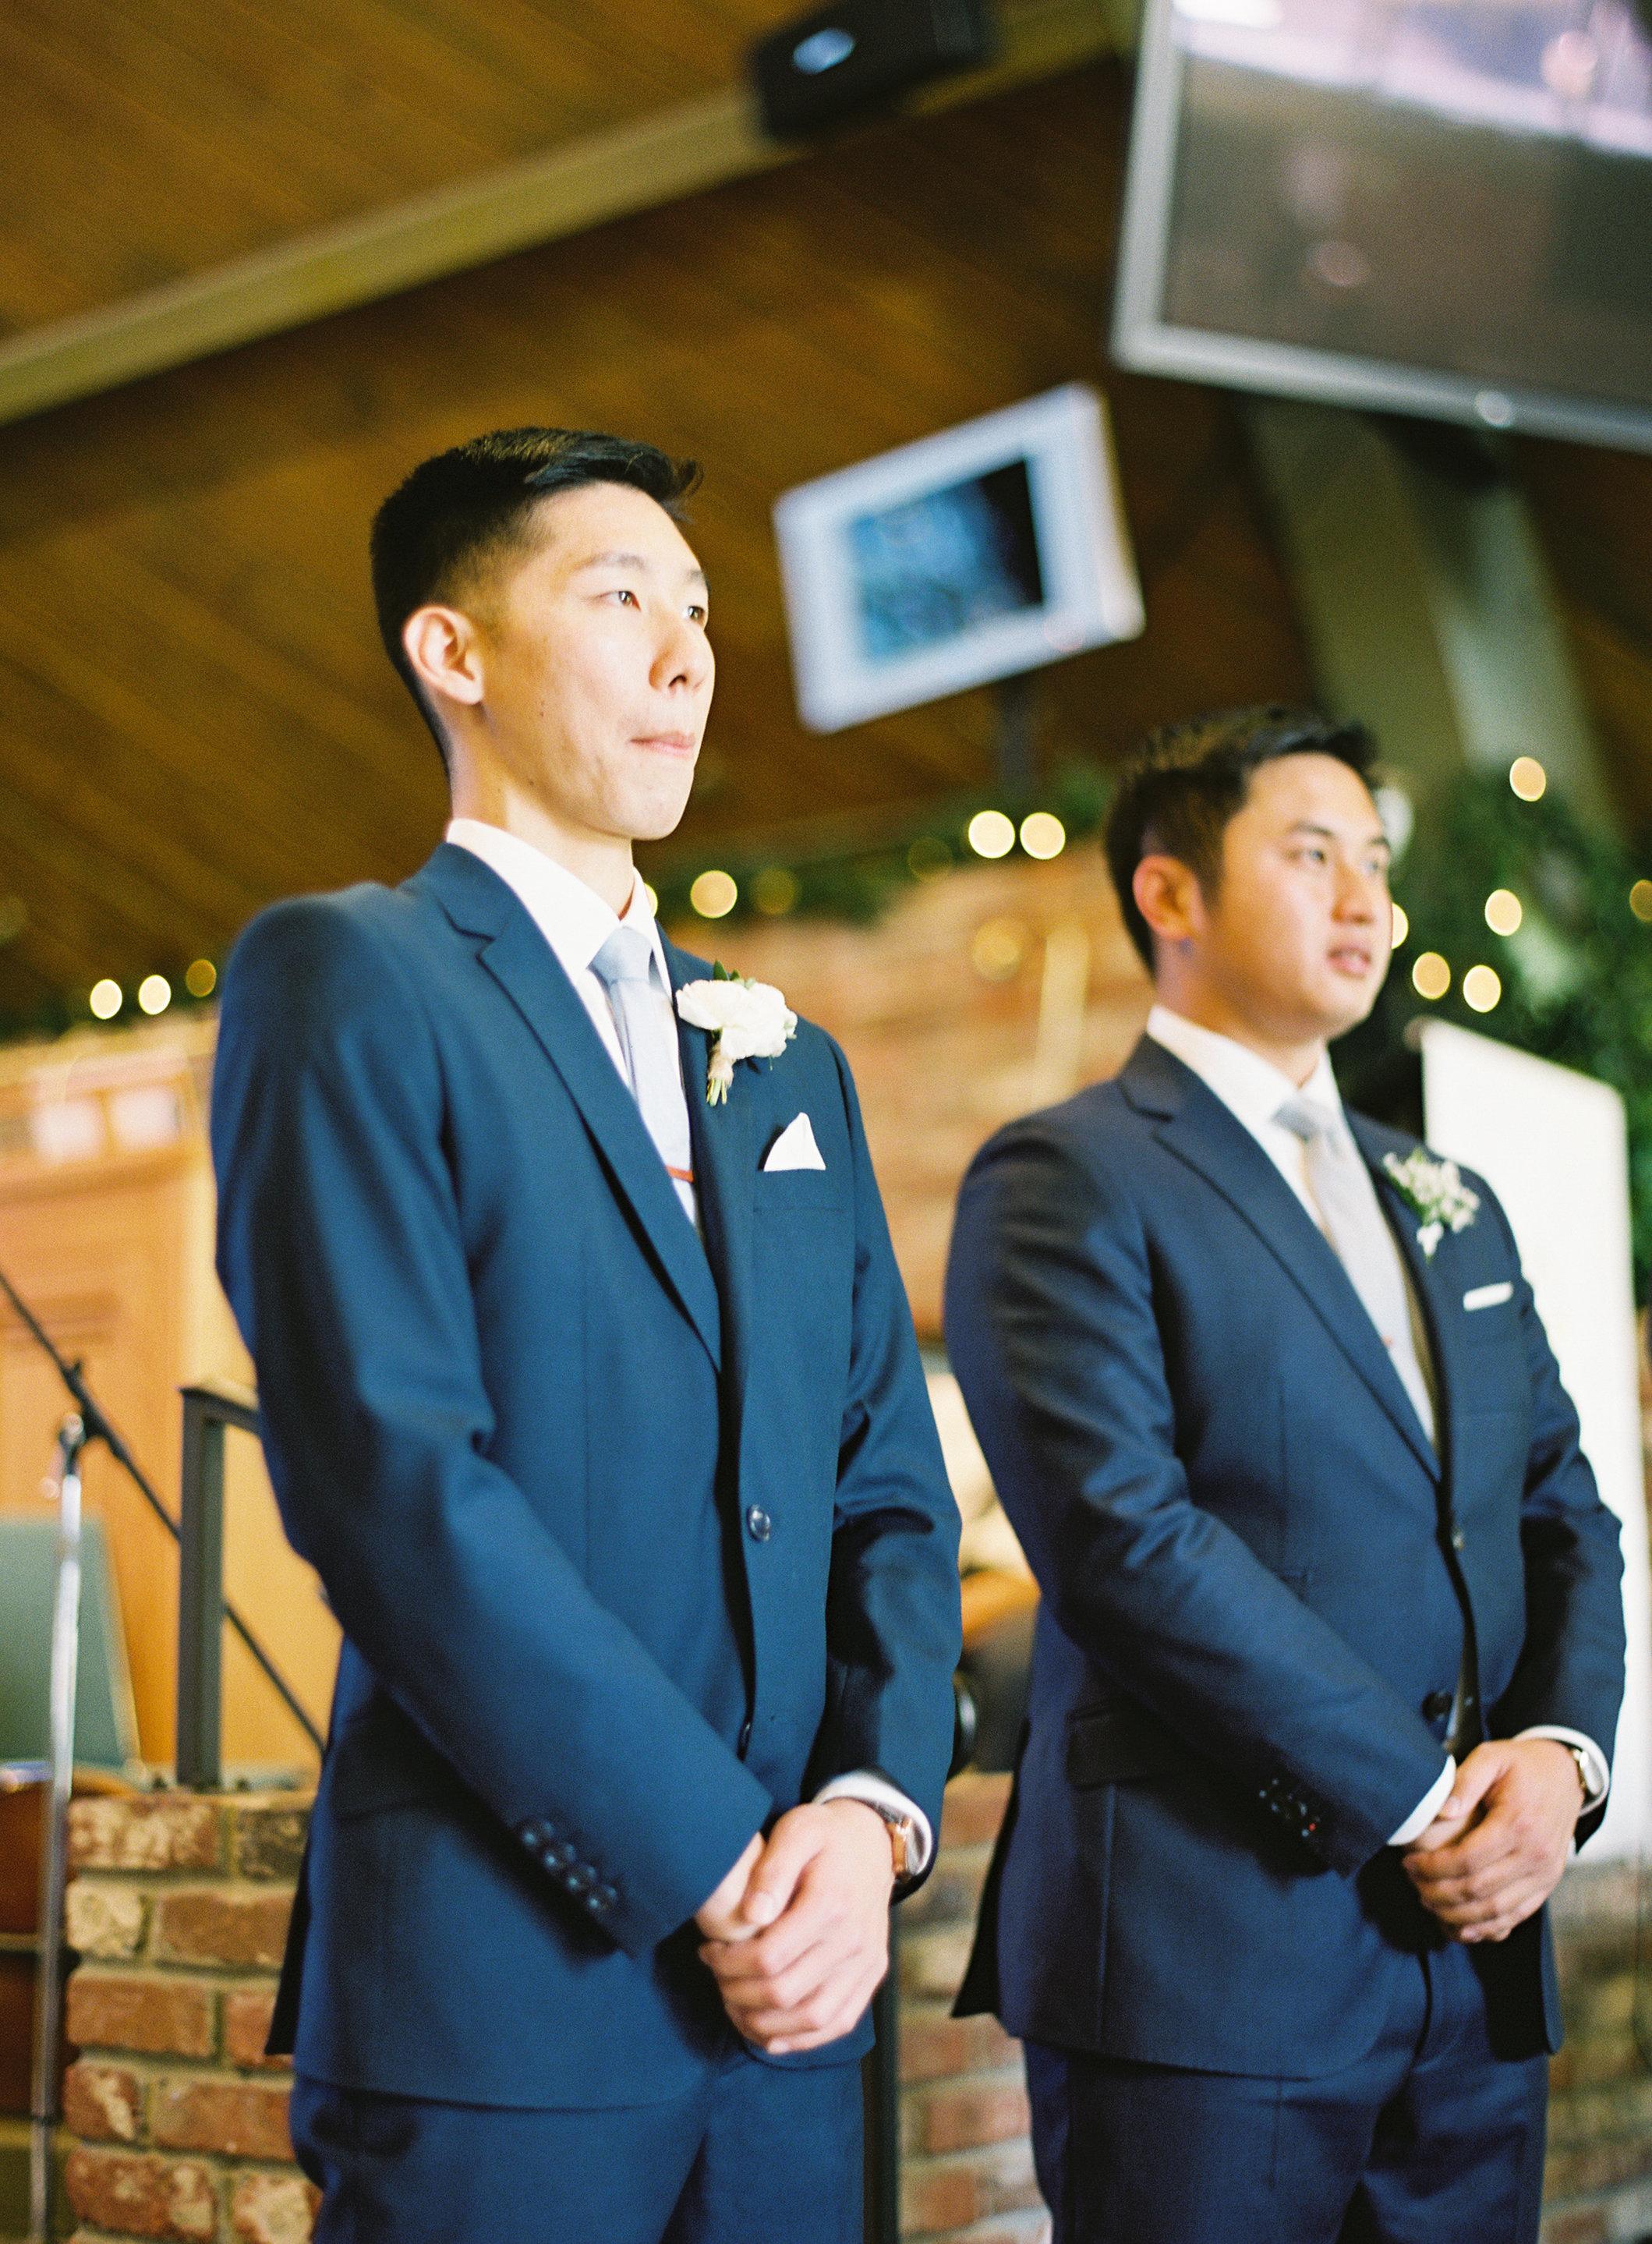 Ceremony_006.jpg